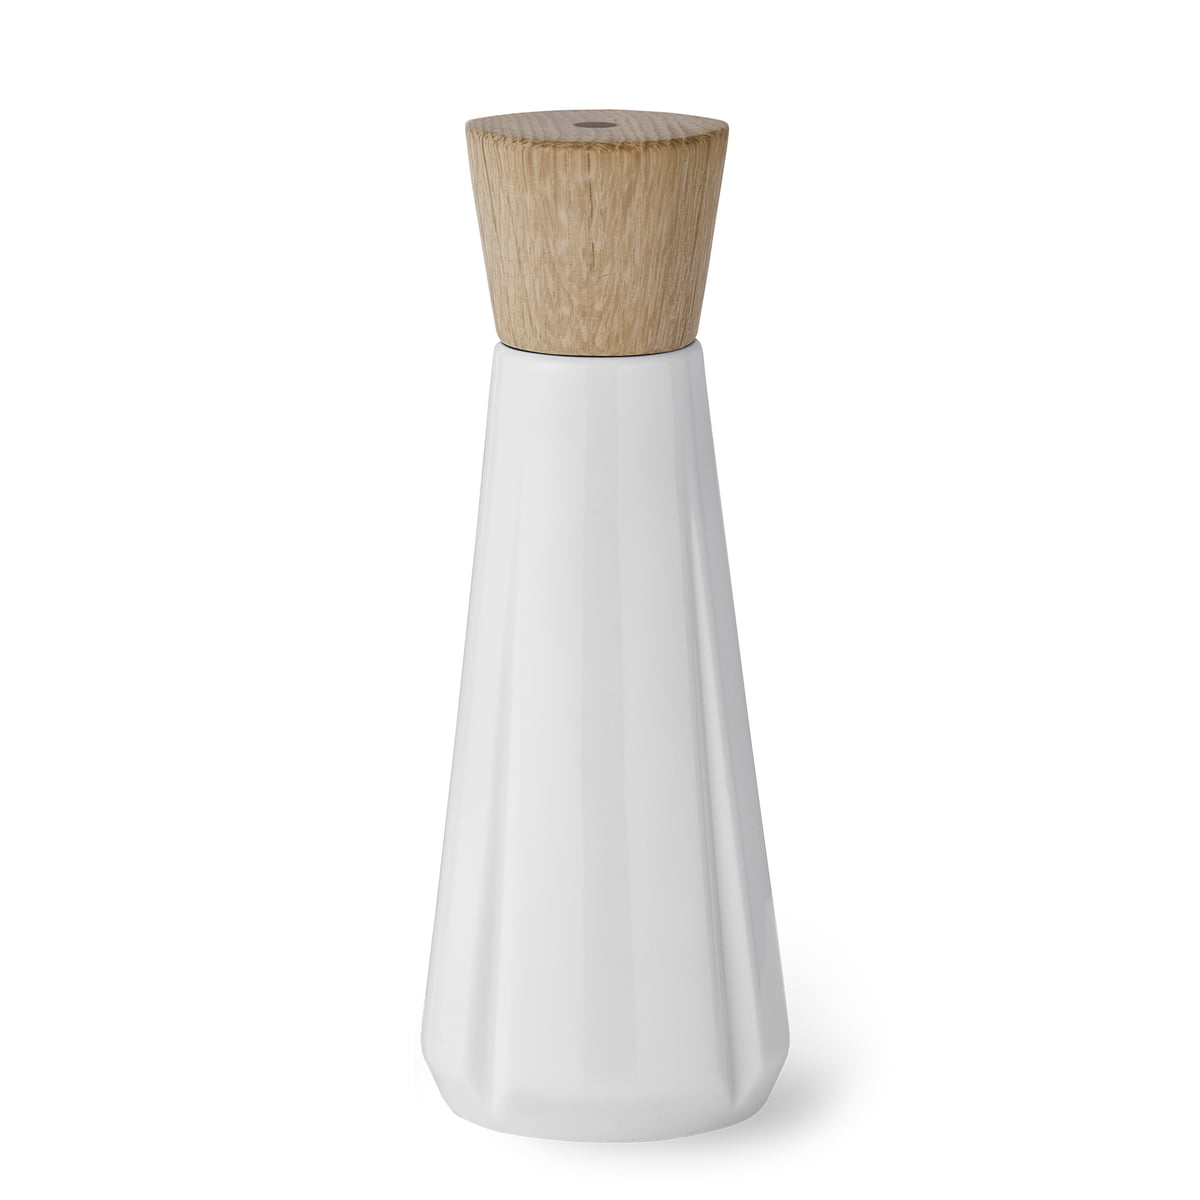 Rosendahl - Grand Cru Pfeffermühle H 19 cm, eiche / weiß